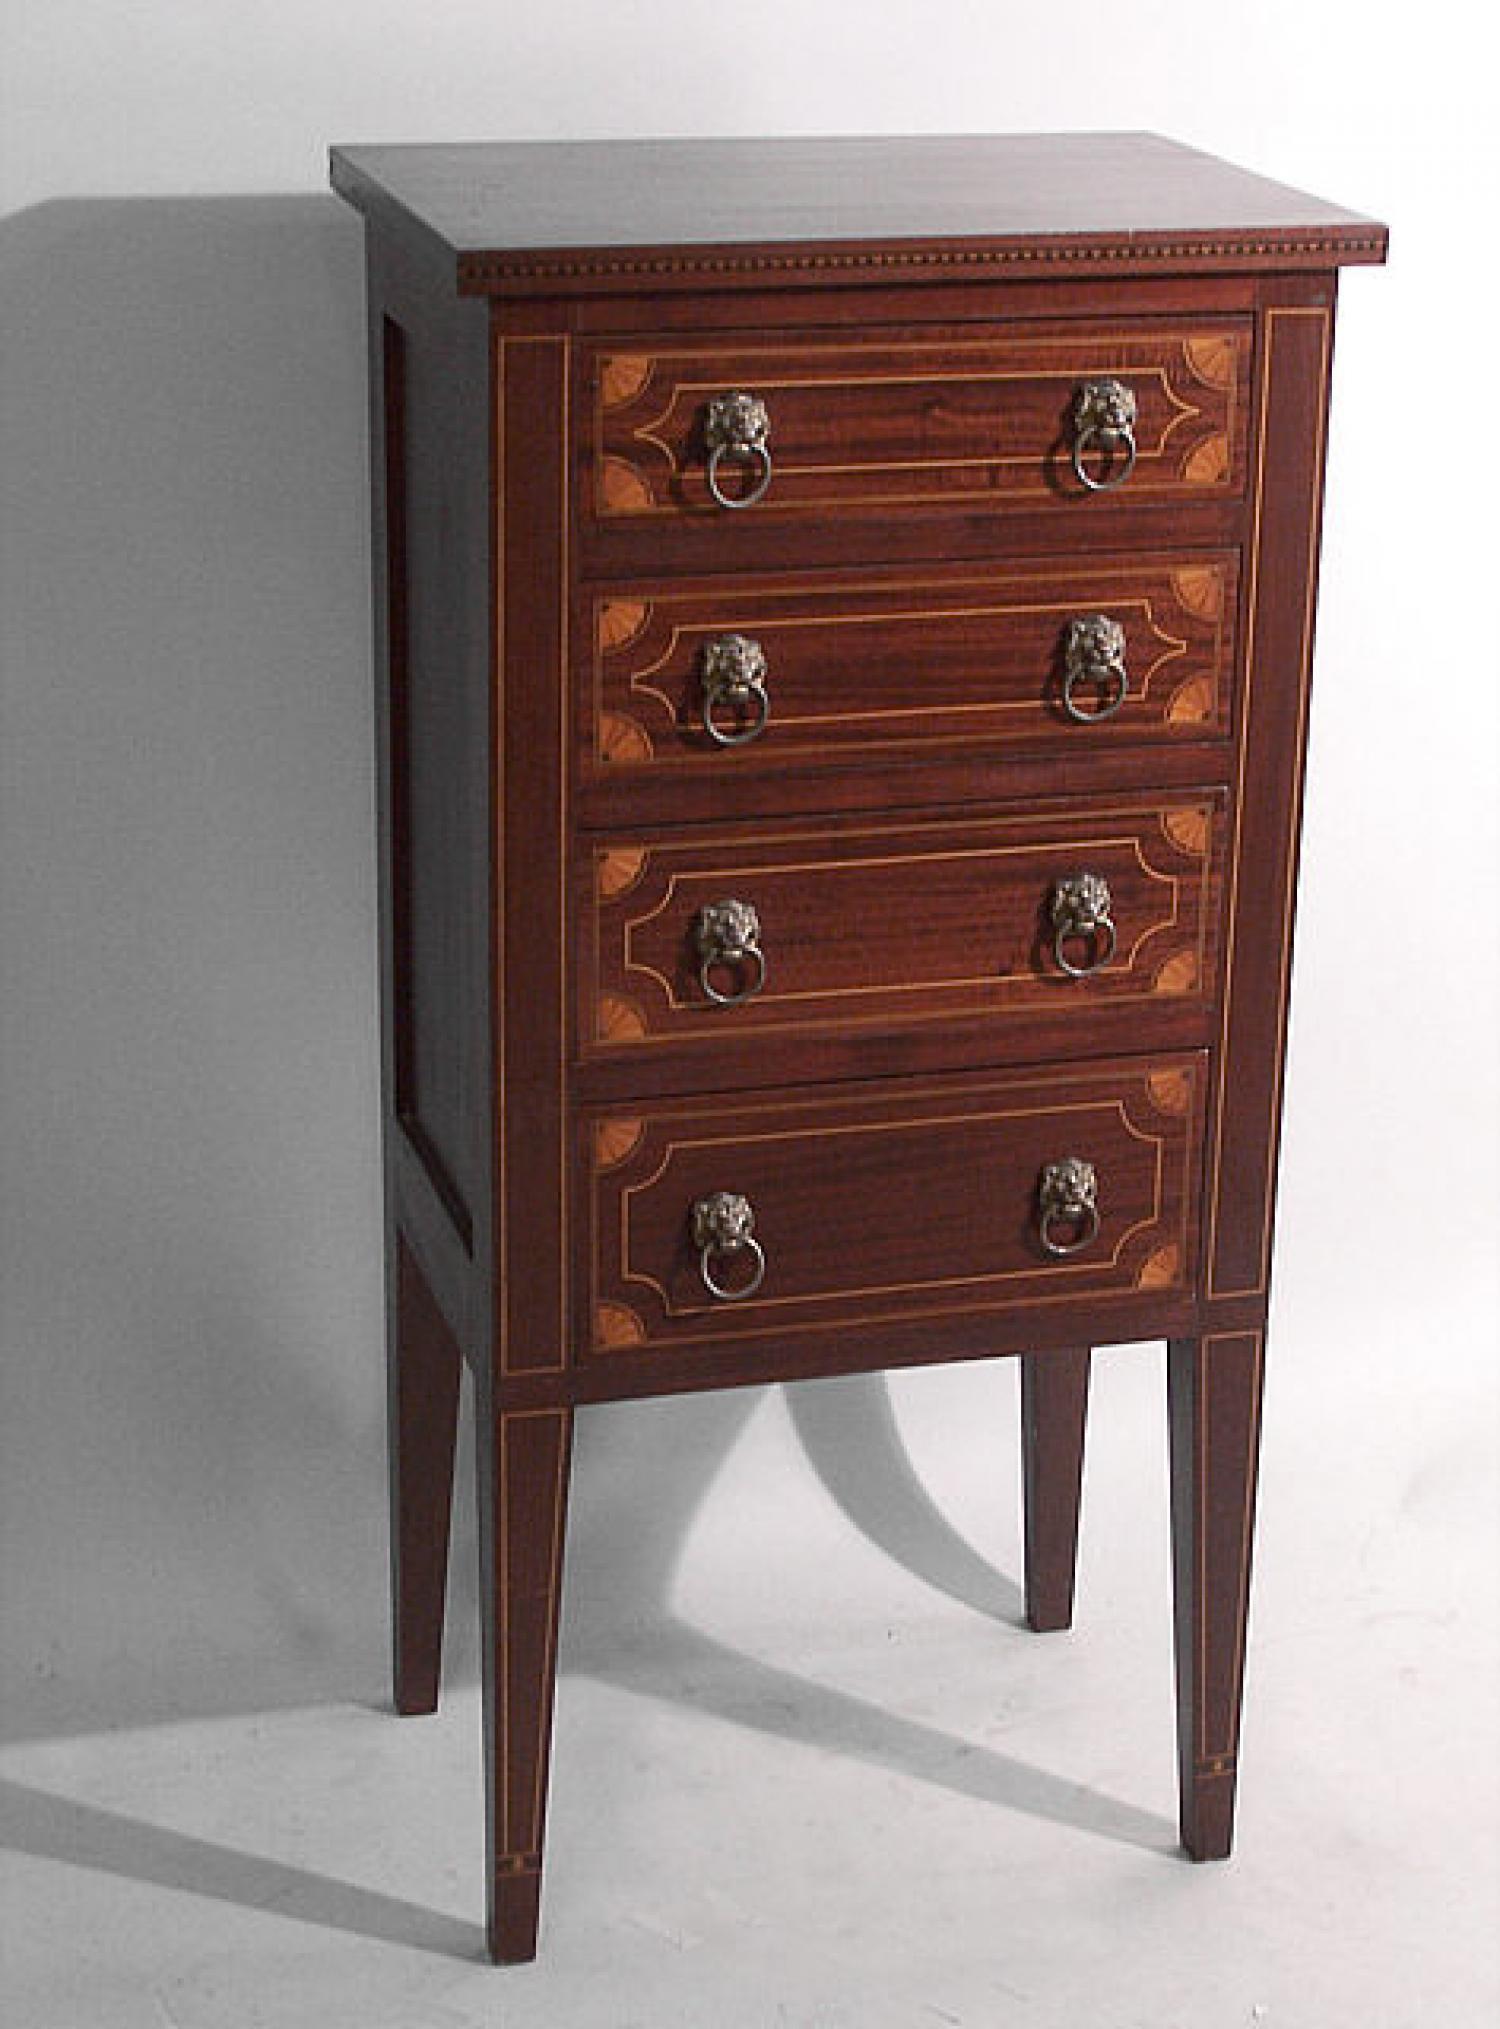 Mahogany Hepplewhite style linen chest circa 1880